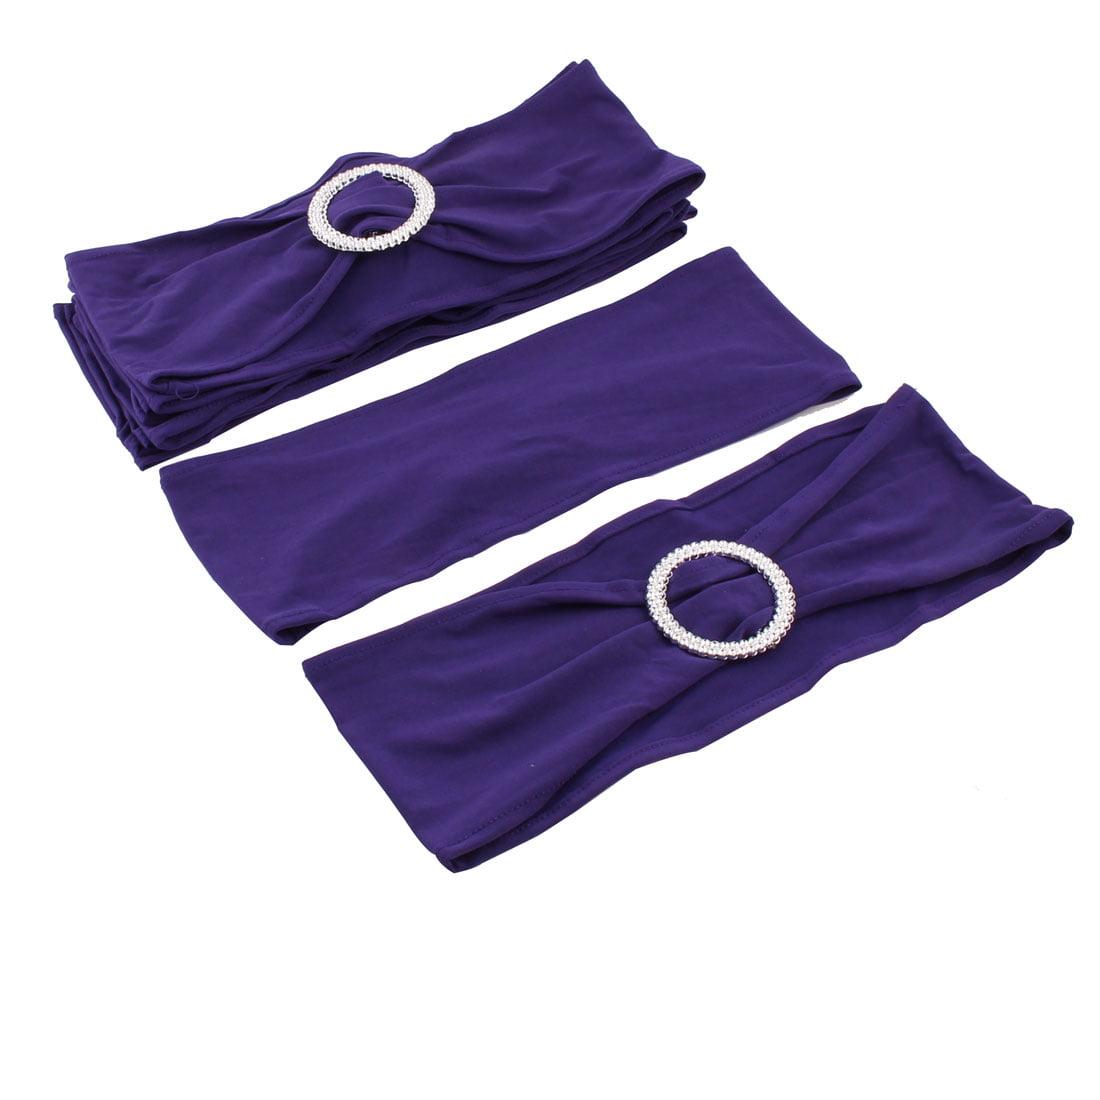 Spandex Elastic Chair Covers Bands Buckle Slider Sashes Bows Dark Purple 10pcs